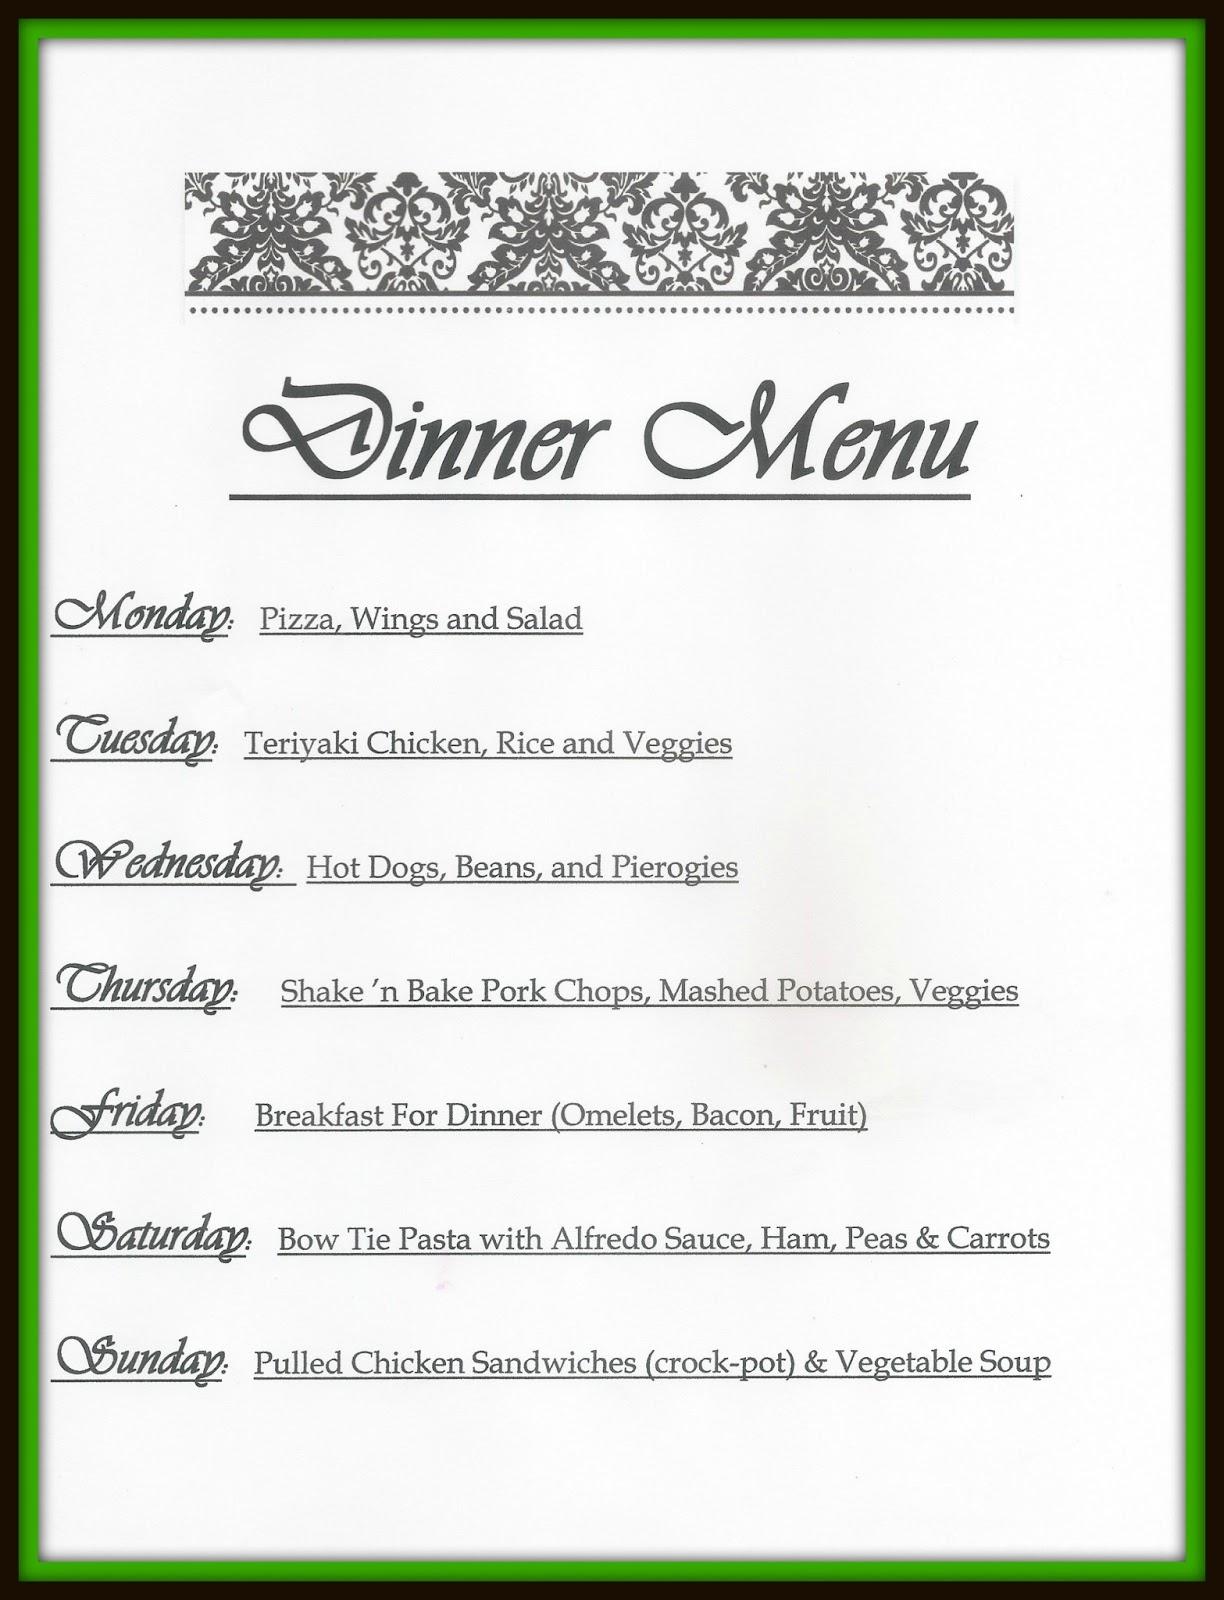 Dinner Menu Template Do you menu plan?